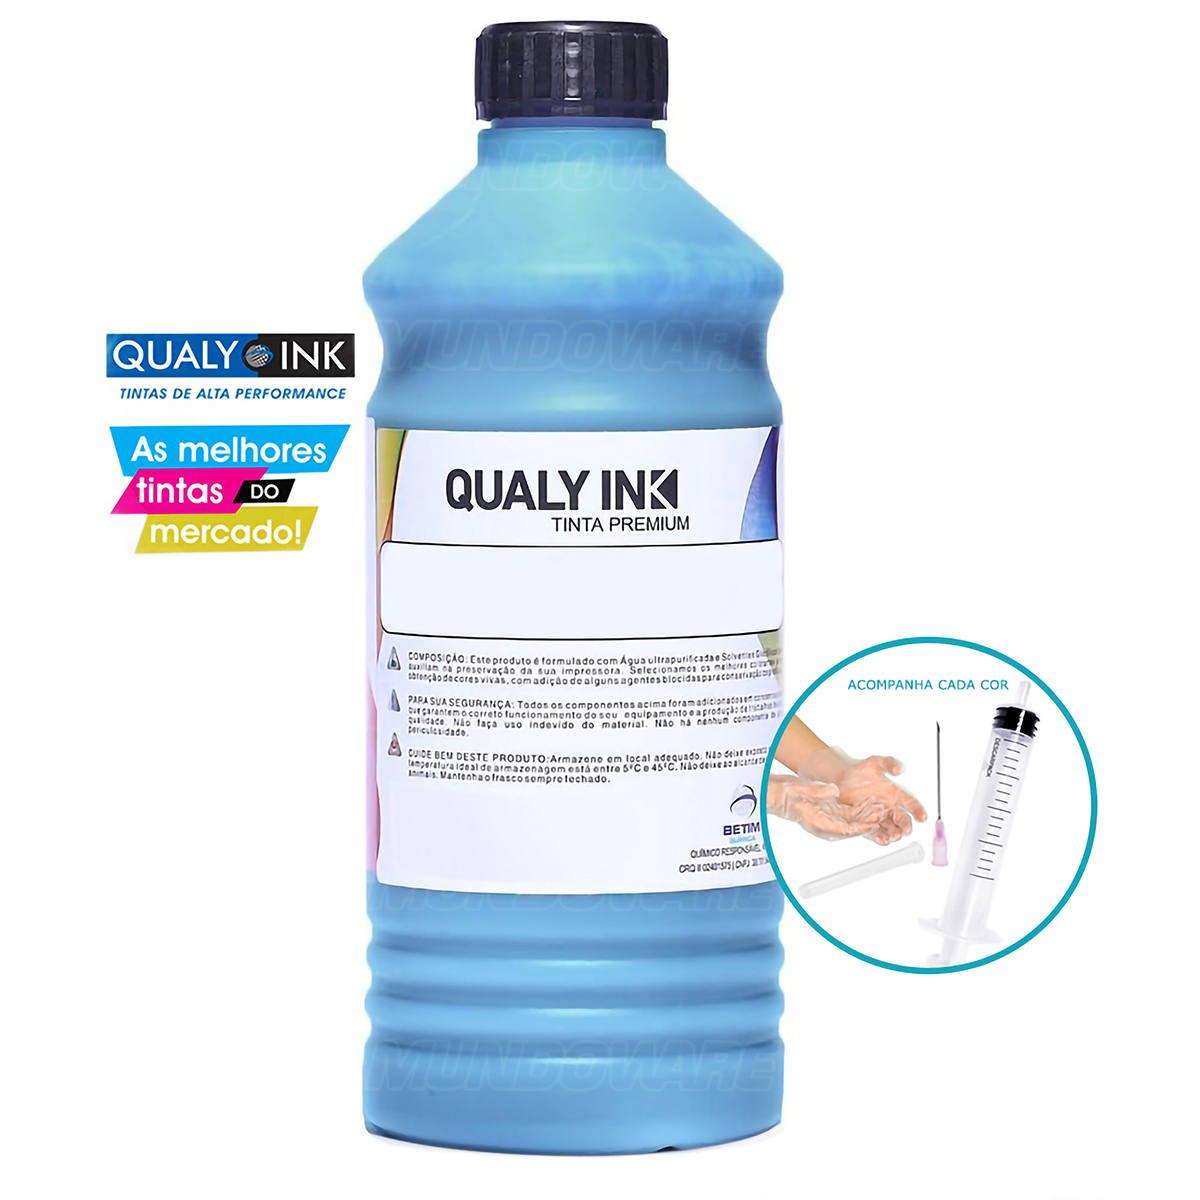 Tinta Corante Qualy-Ink para Impressora Brother DCP-J140w J105 J200 MFC-J6720dw J6920dw 6890cdw Ciano Refil 1L